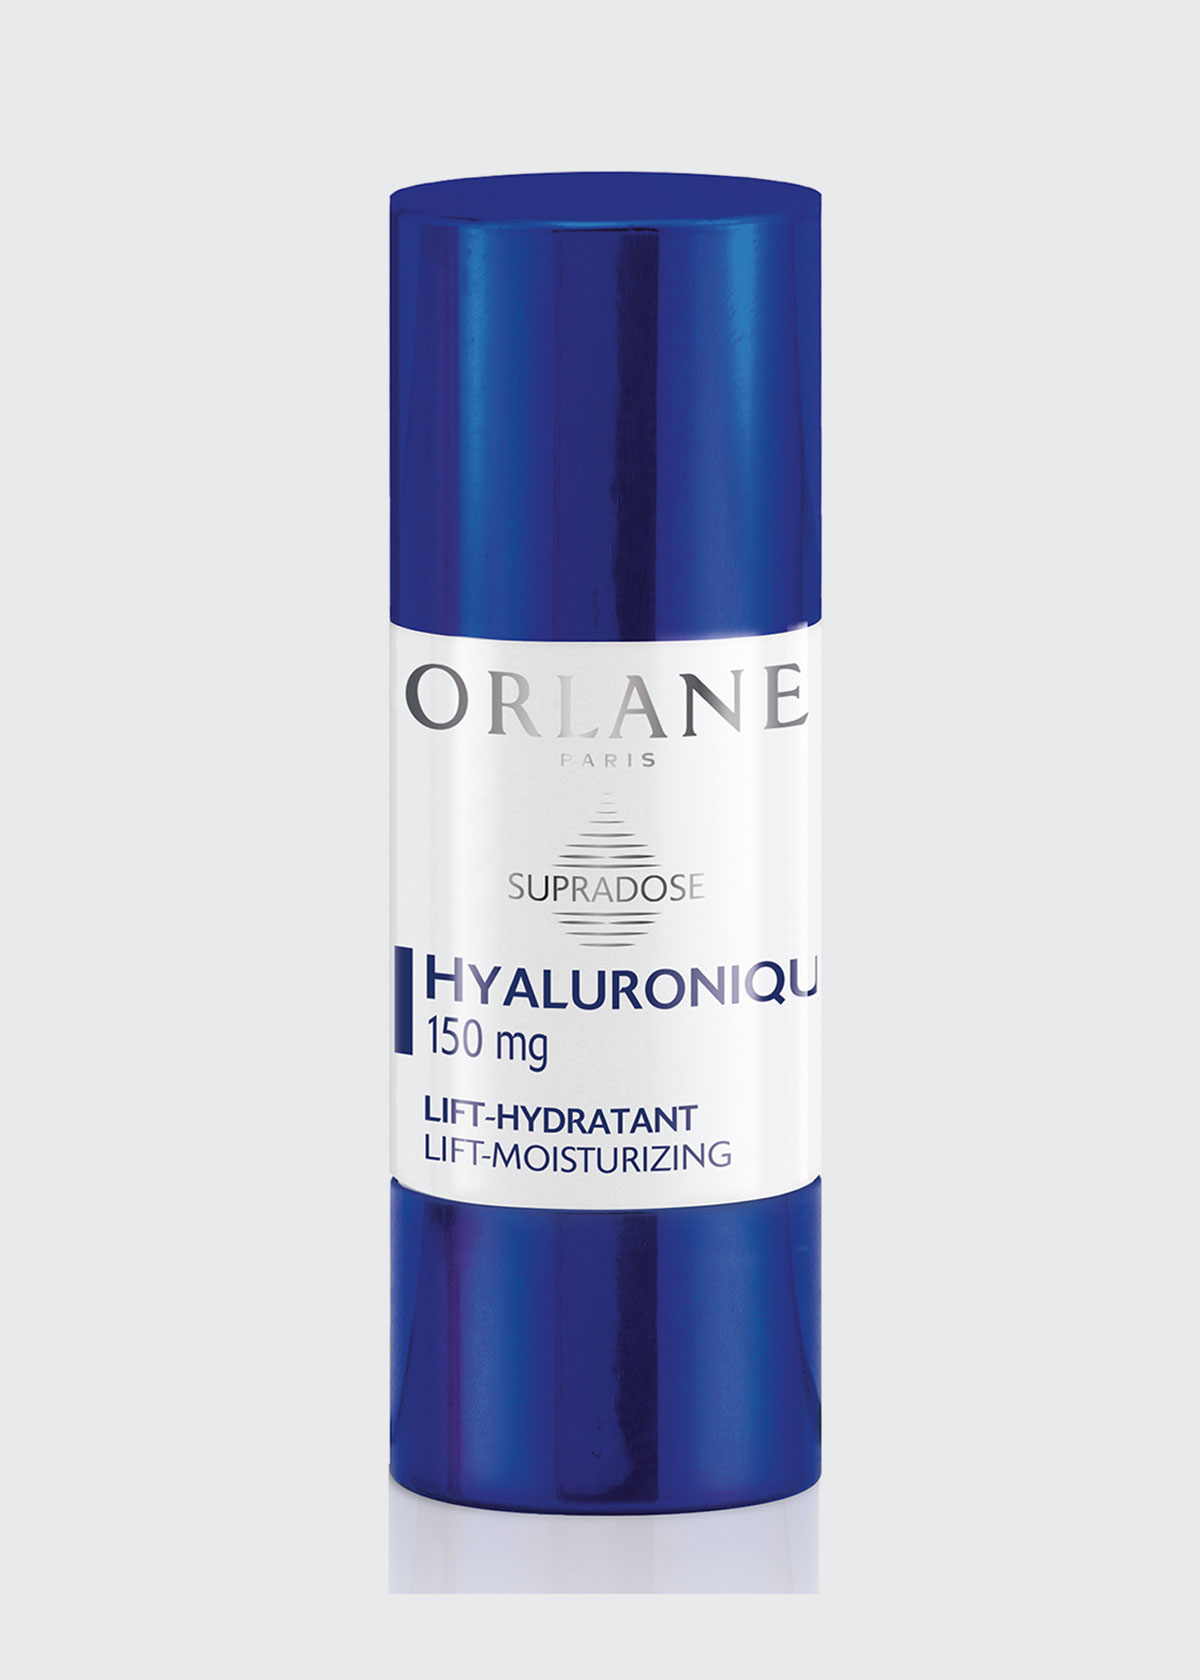 Orlane HYALURONIQUE SUPRADOSE, 0.5 OZ./ 15 ML